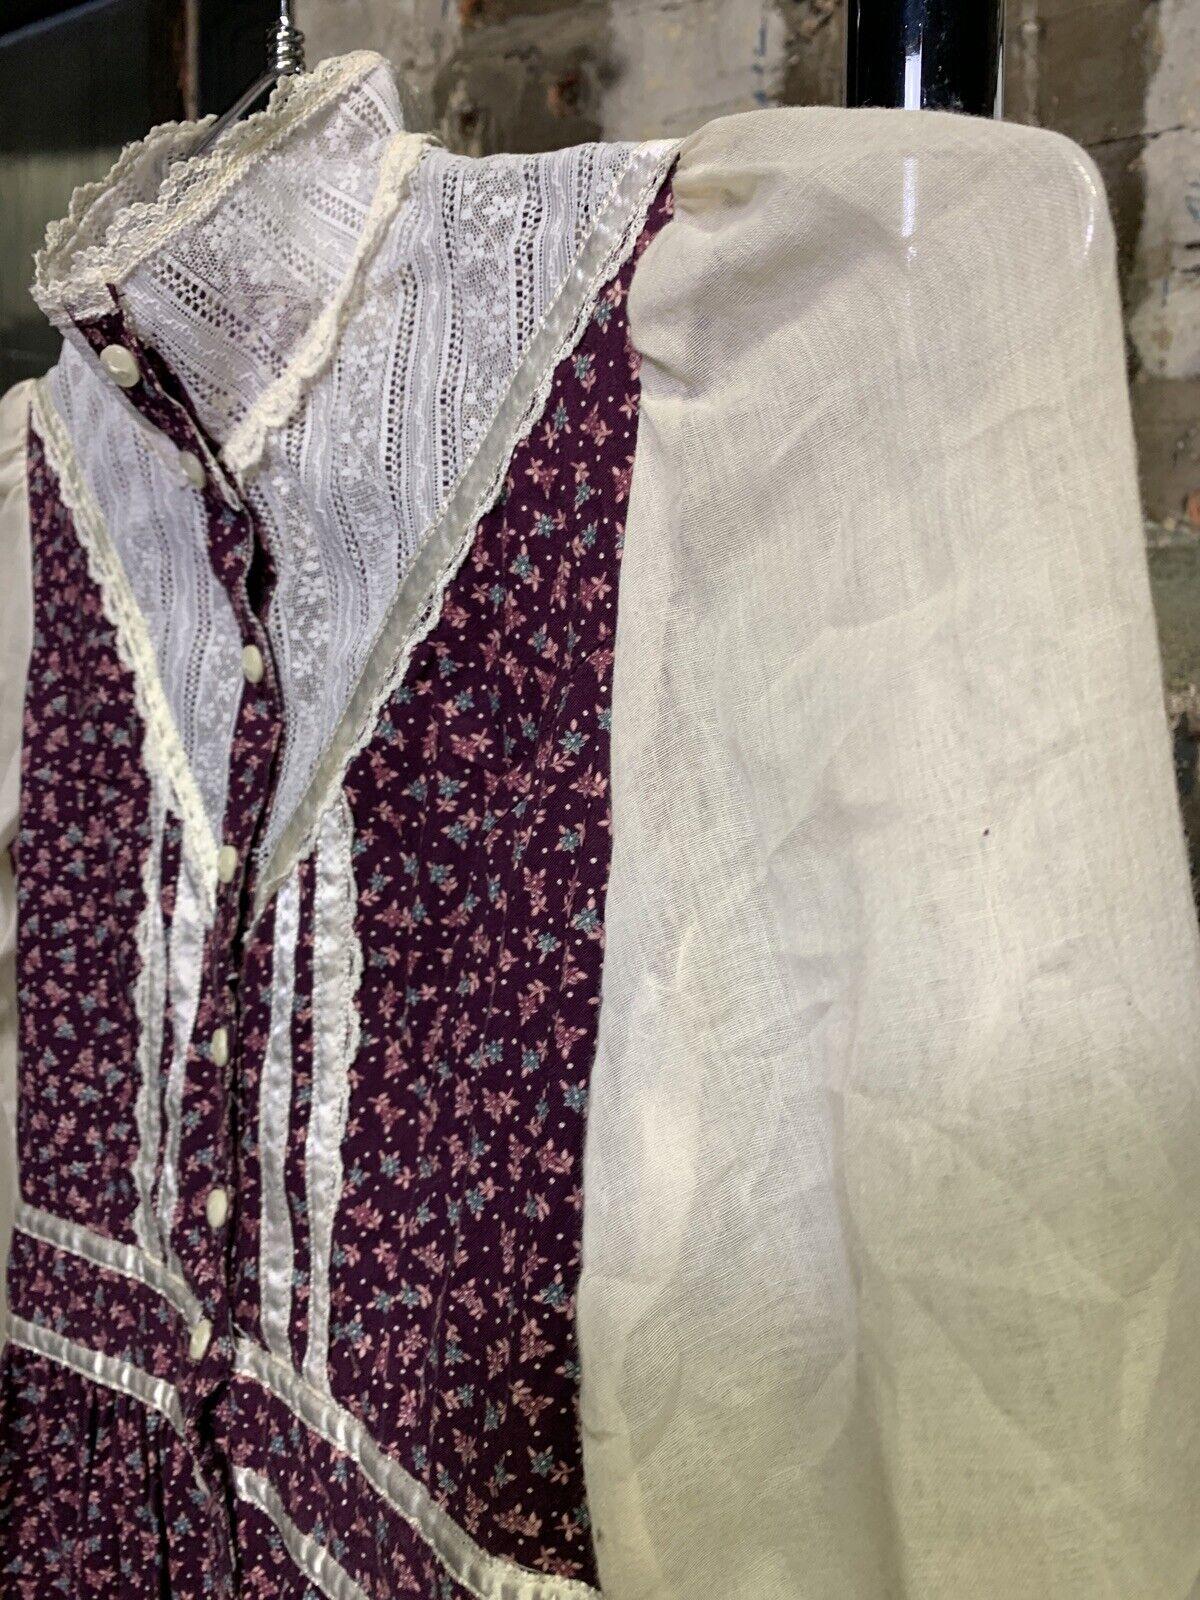 gunne sax 1970s women's vintage dress - image 5